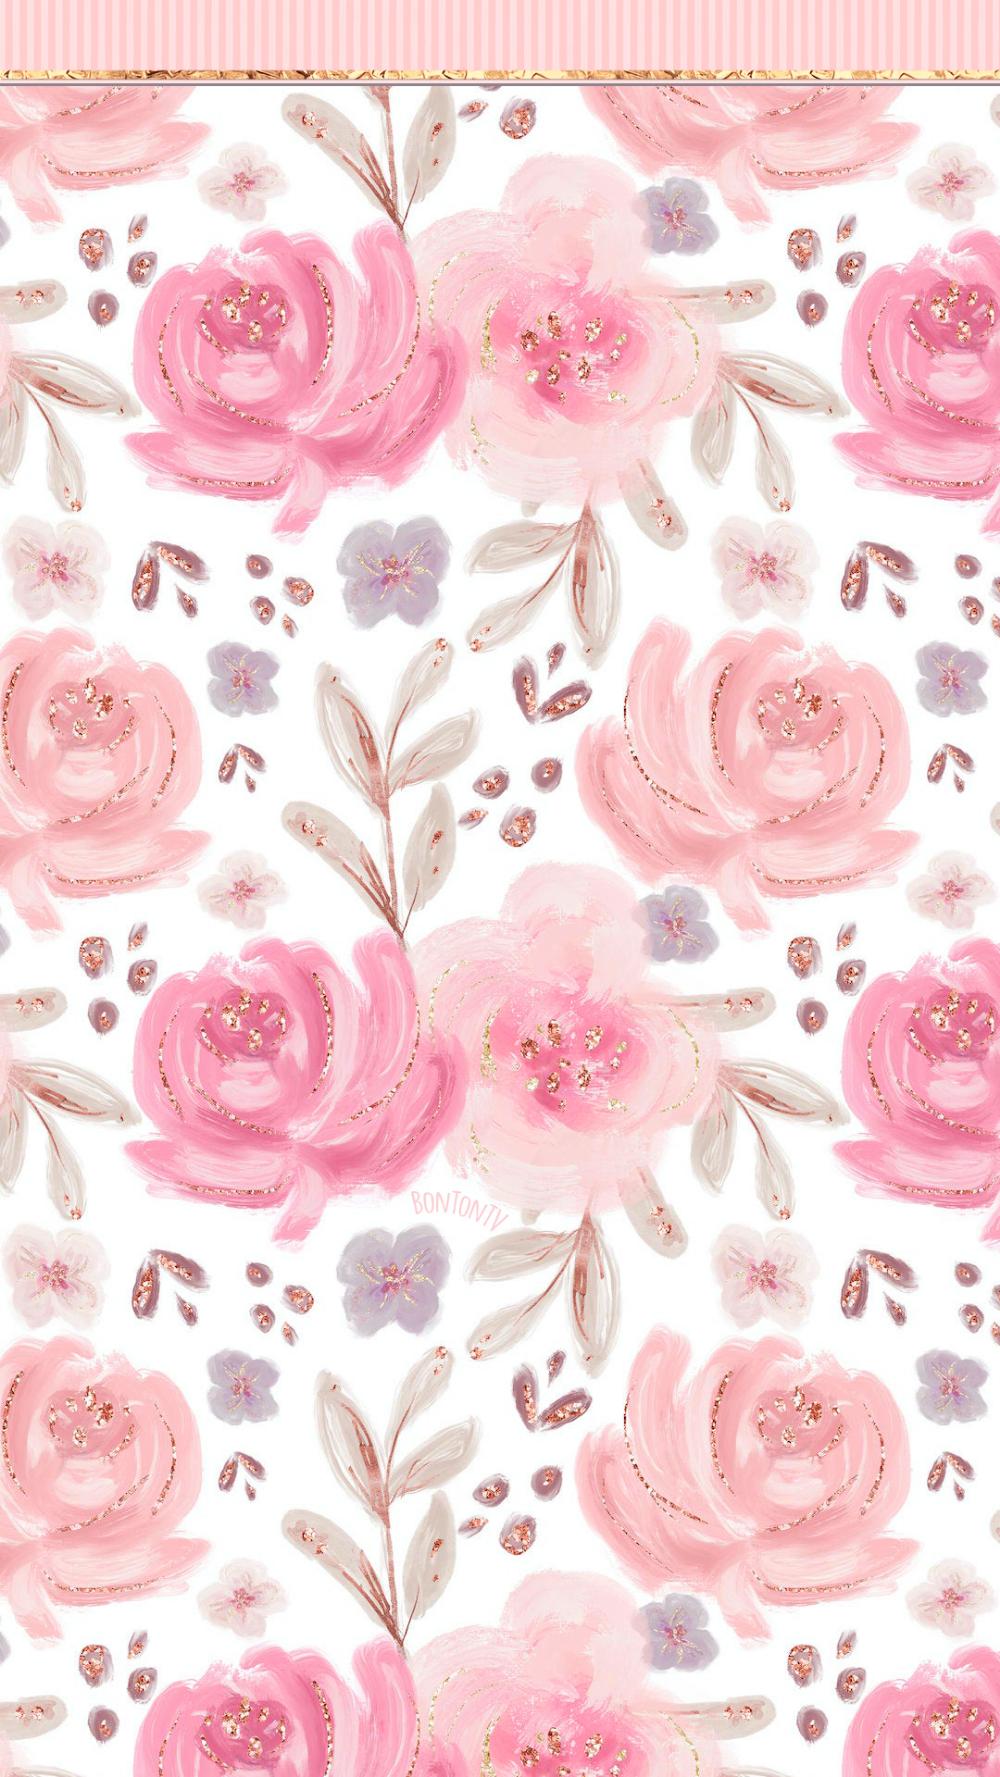 Phone Wallpapers Hd By Bonton Tv Free Download 1080x1920 Iphone Wallpapers And Flower Phone Wallpaper Pink Flowers Wallpaper Fall Background Wallpaper